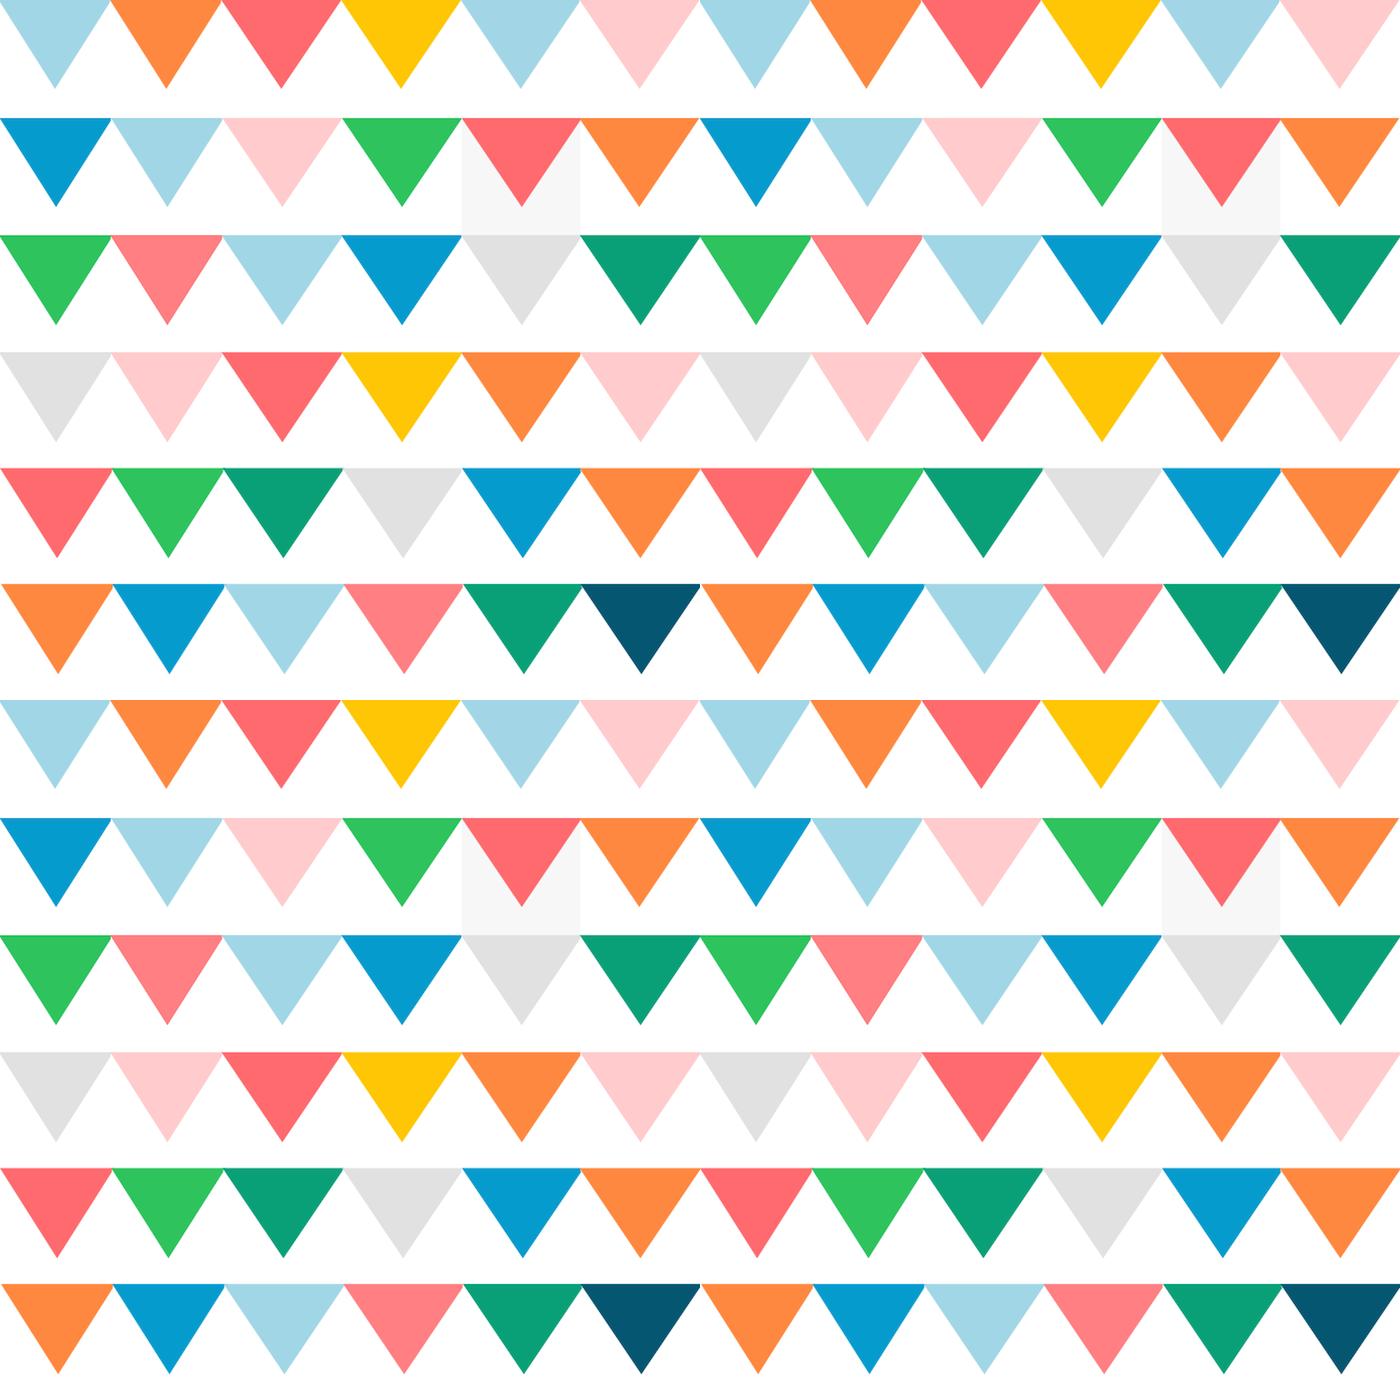 How to make scrapbook paper designs - Meinlilapark Free Scrapbooking Paper Printable Wrap Paper